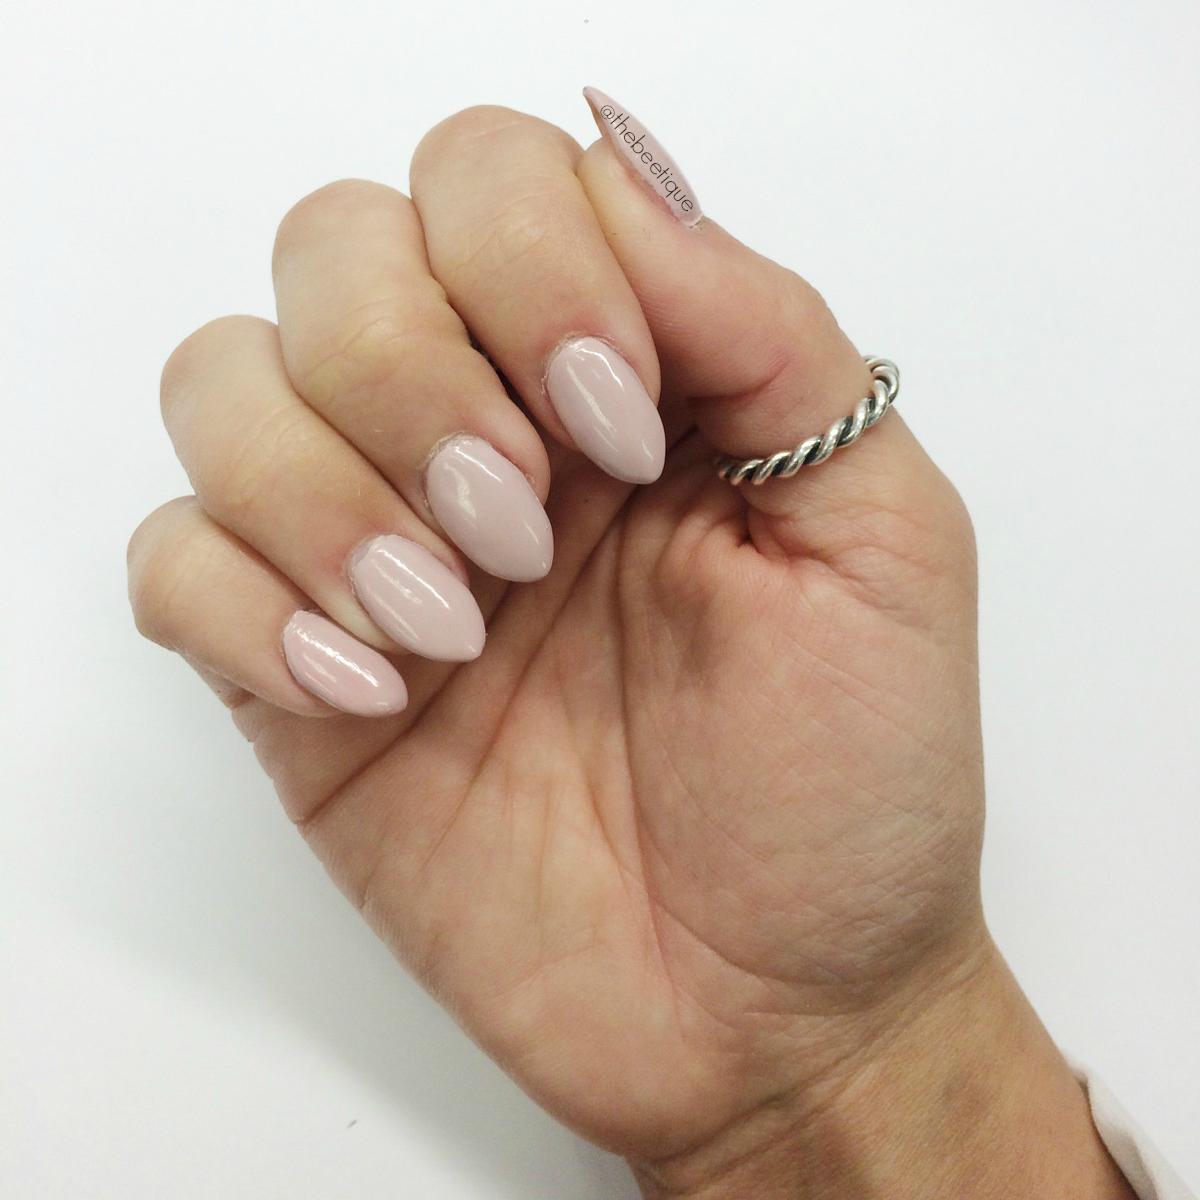 nails gel tips almond shape white joy studio design